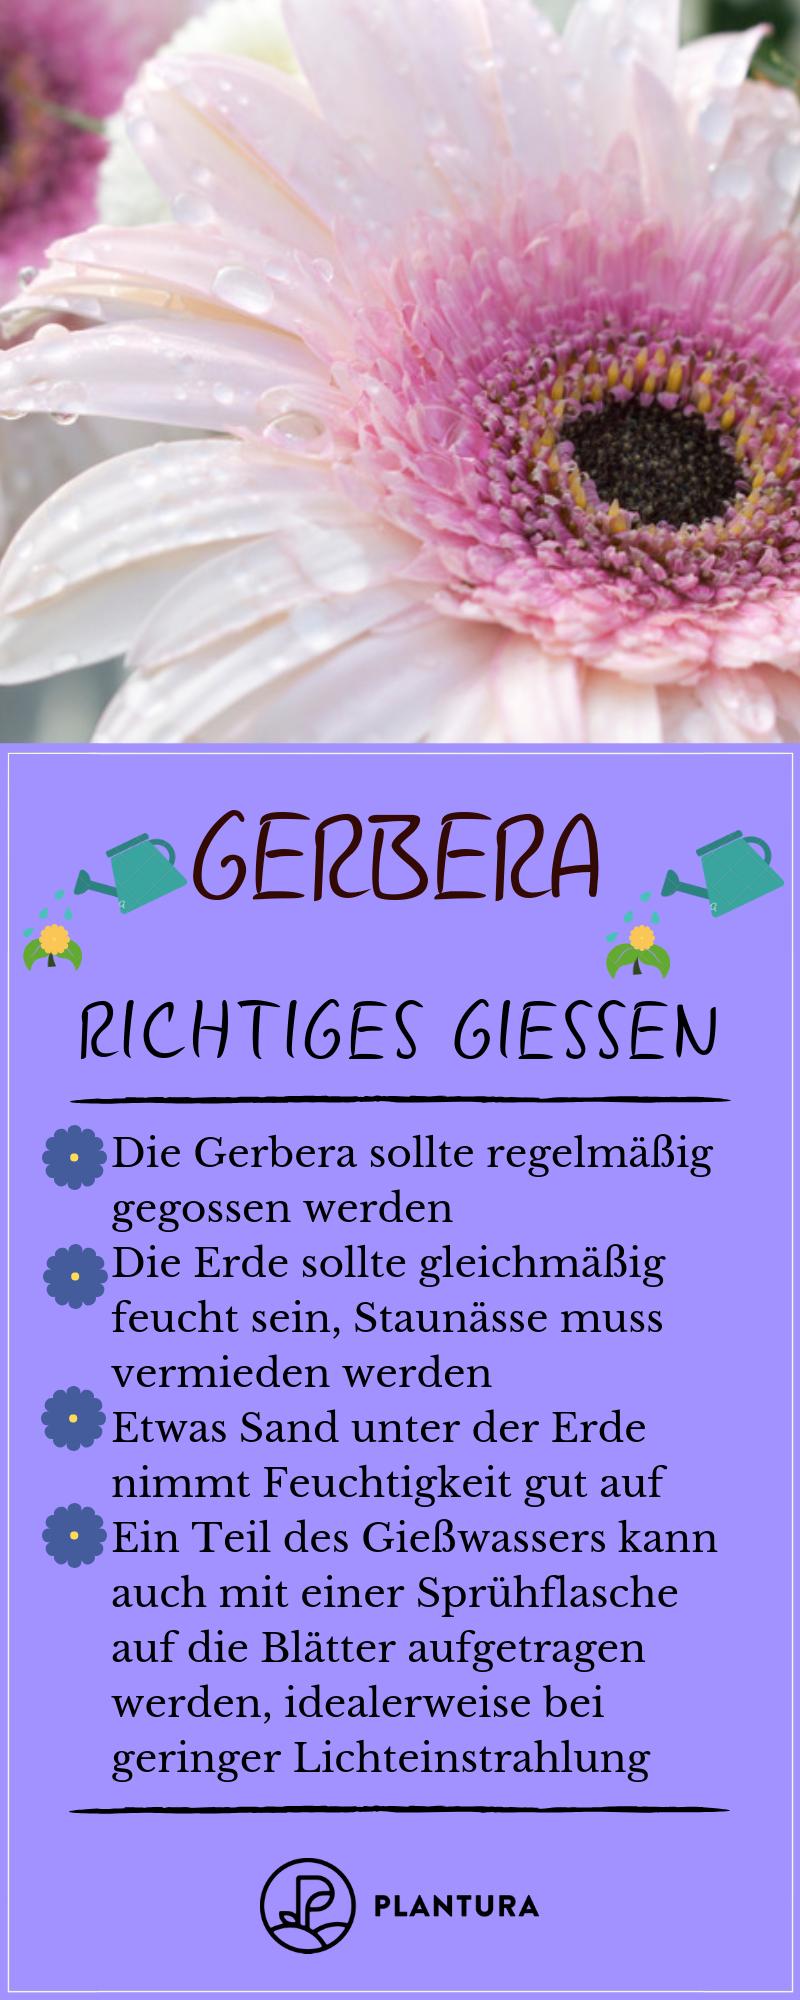 Gerbera Im Topf Im Garten Als Schnittblume Plantura Gerbera Schnittblumen Bepflanzung